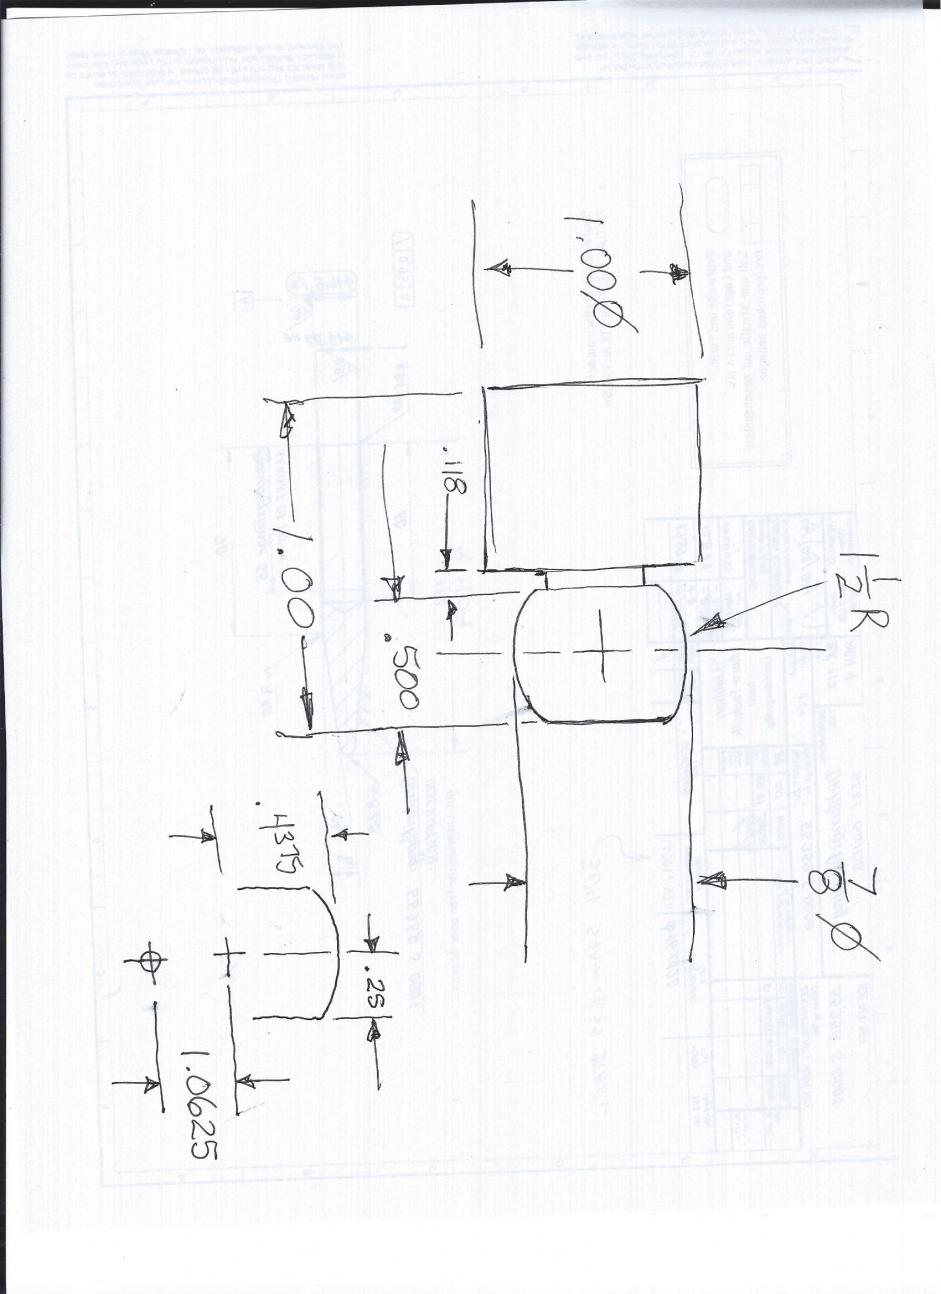 Mazak QT-15 T-32-2 control....... need help with convex radius